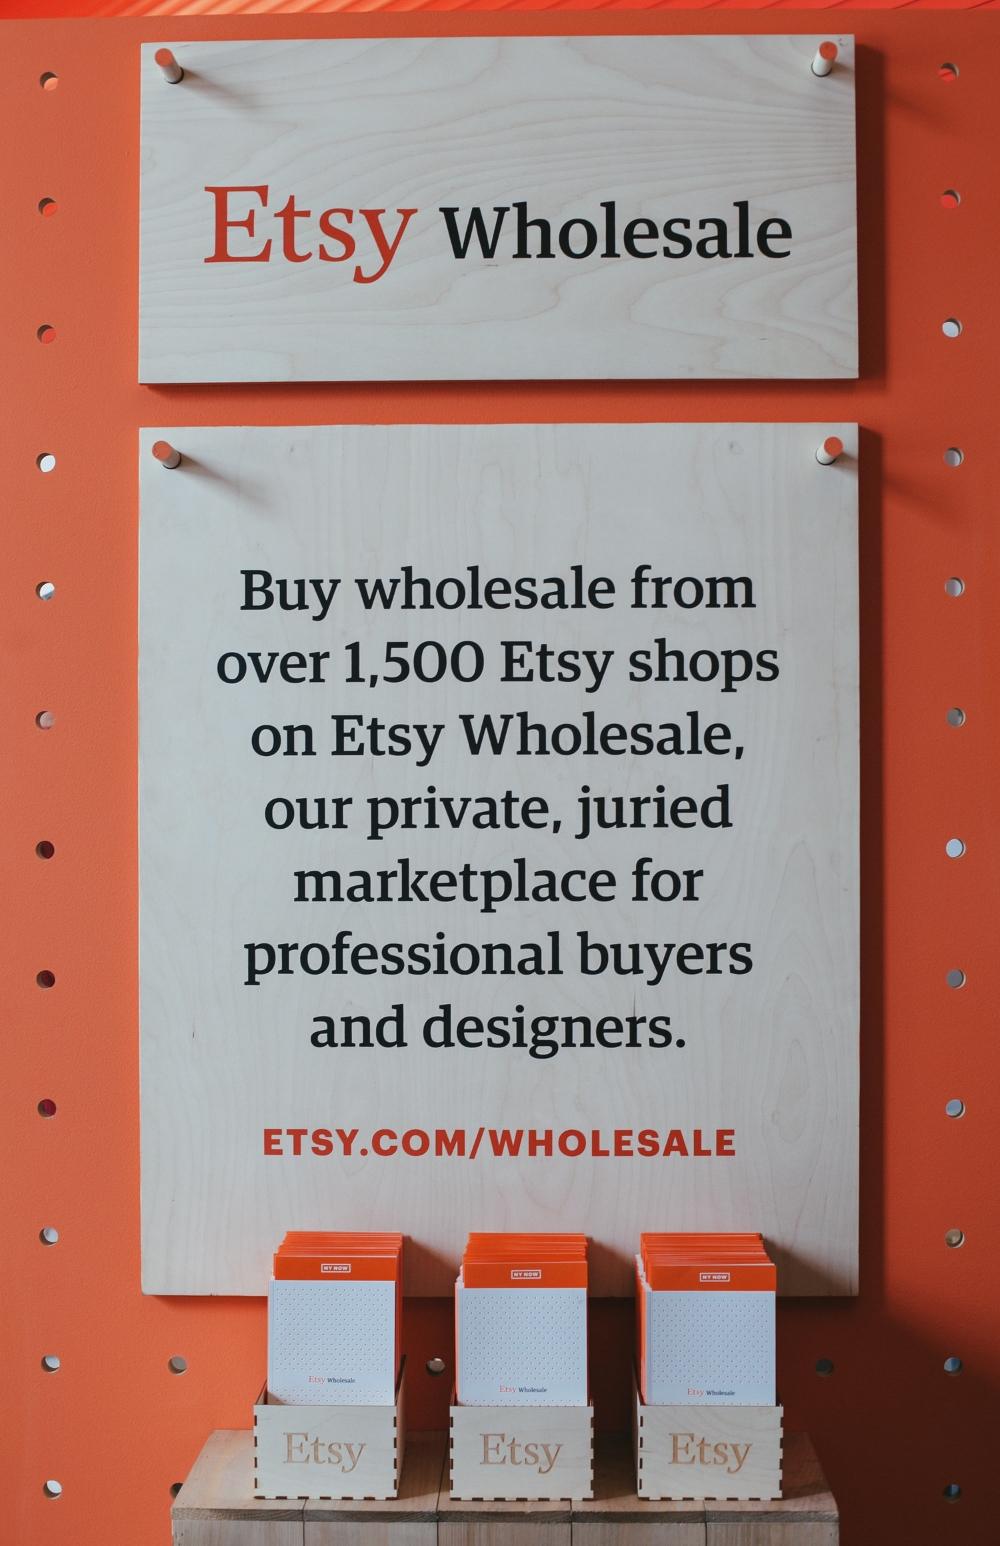 EtsyWholesale_NYNOW-8.jpg